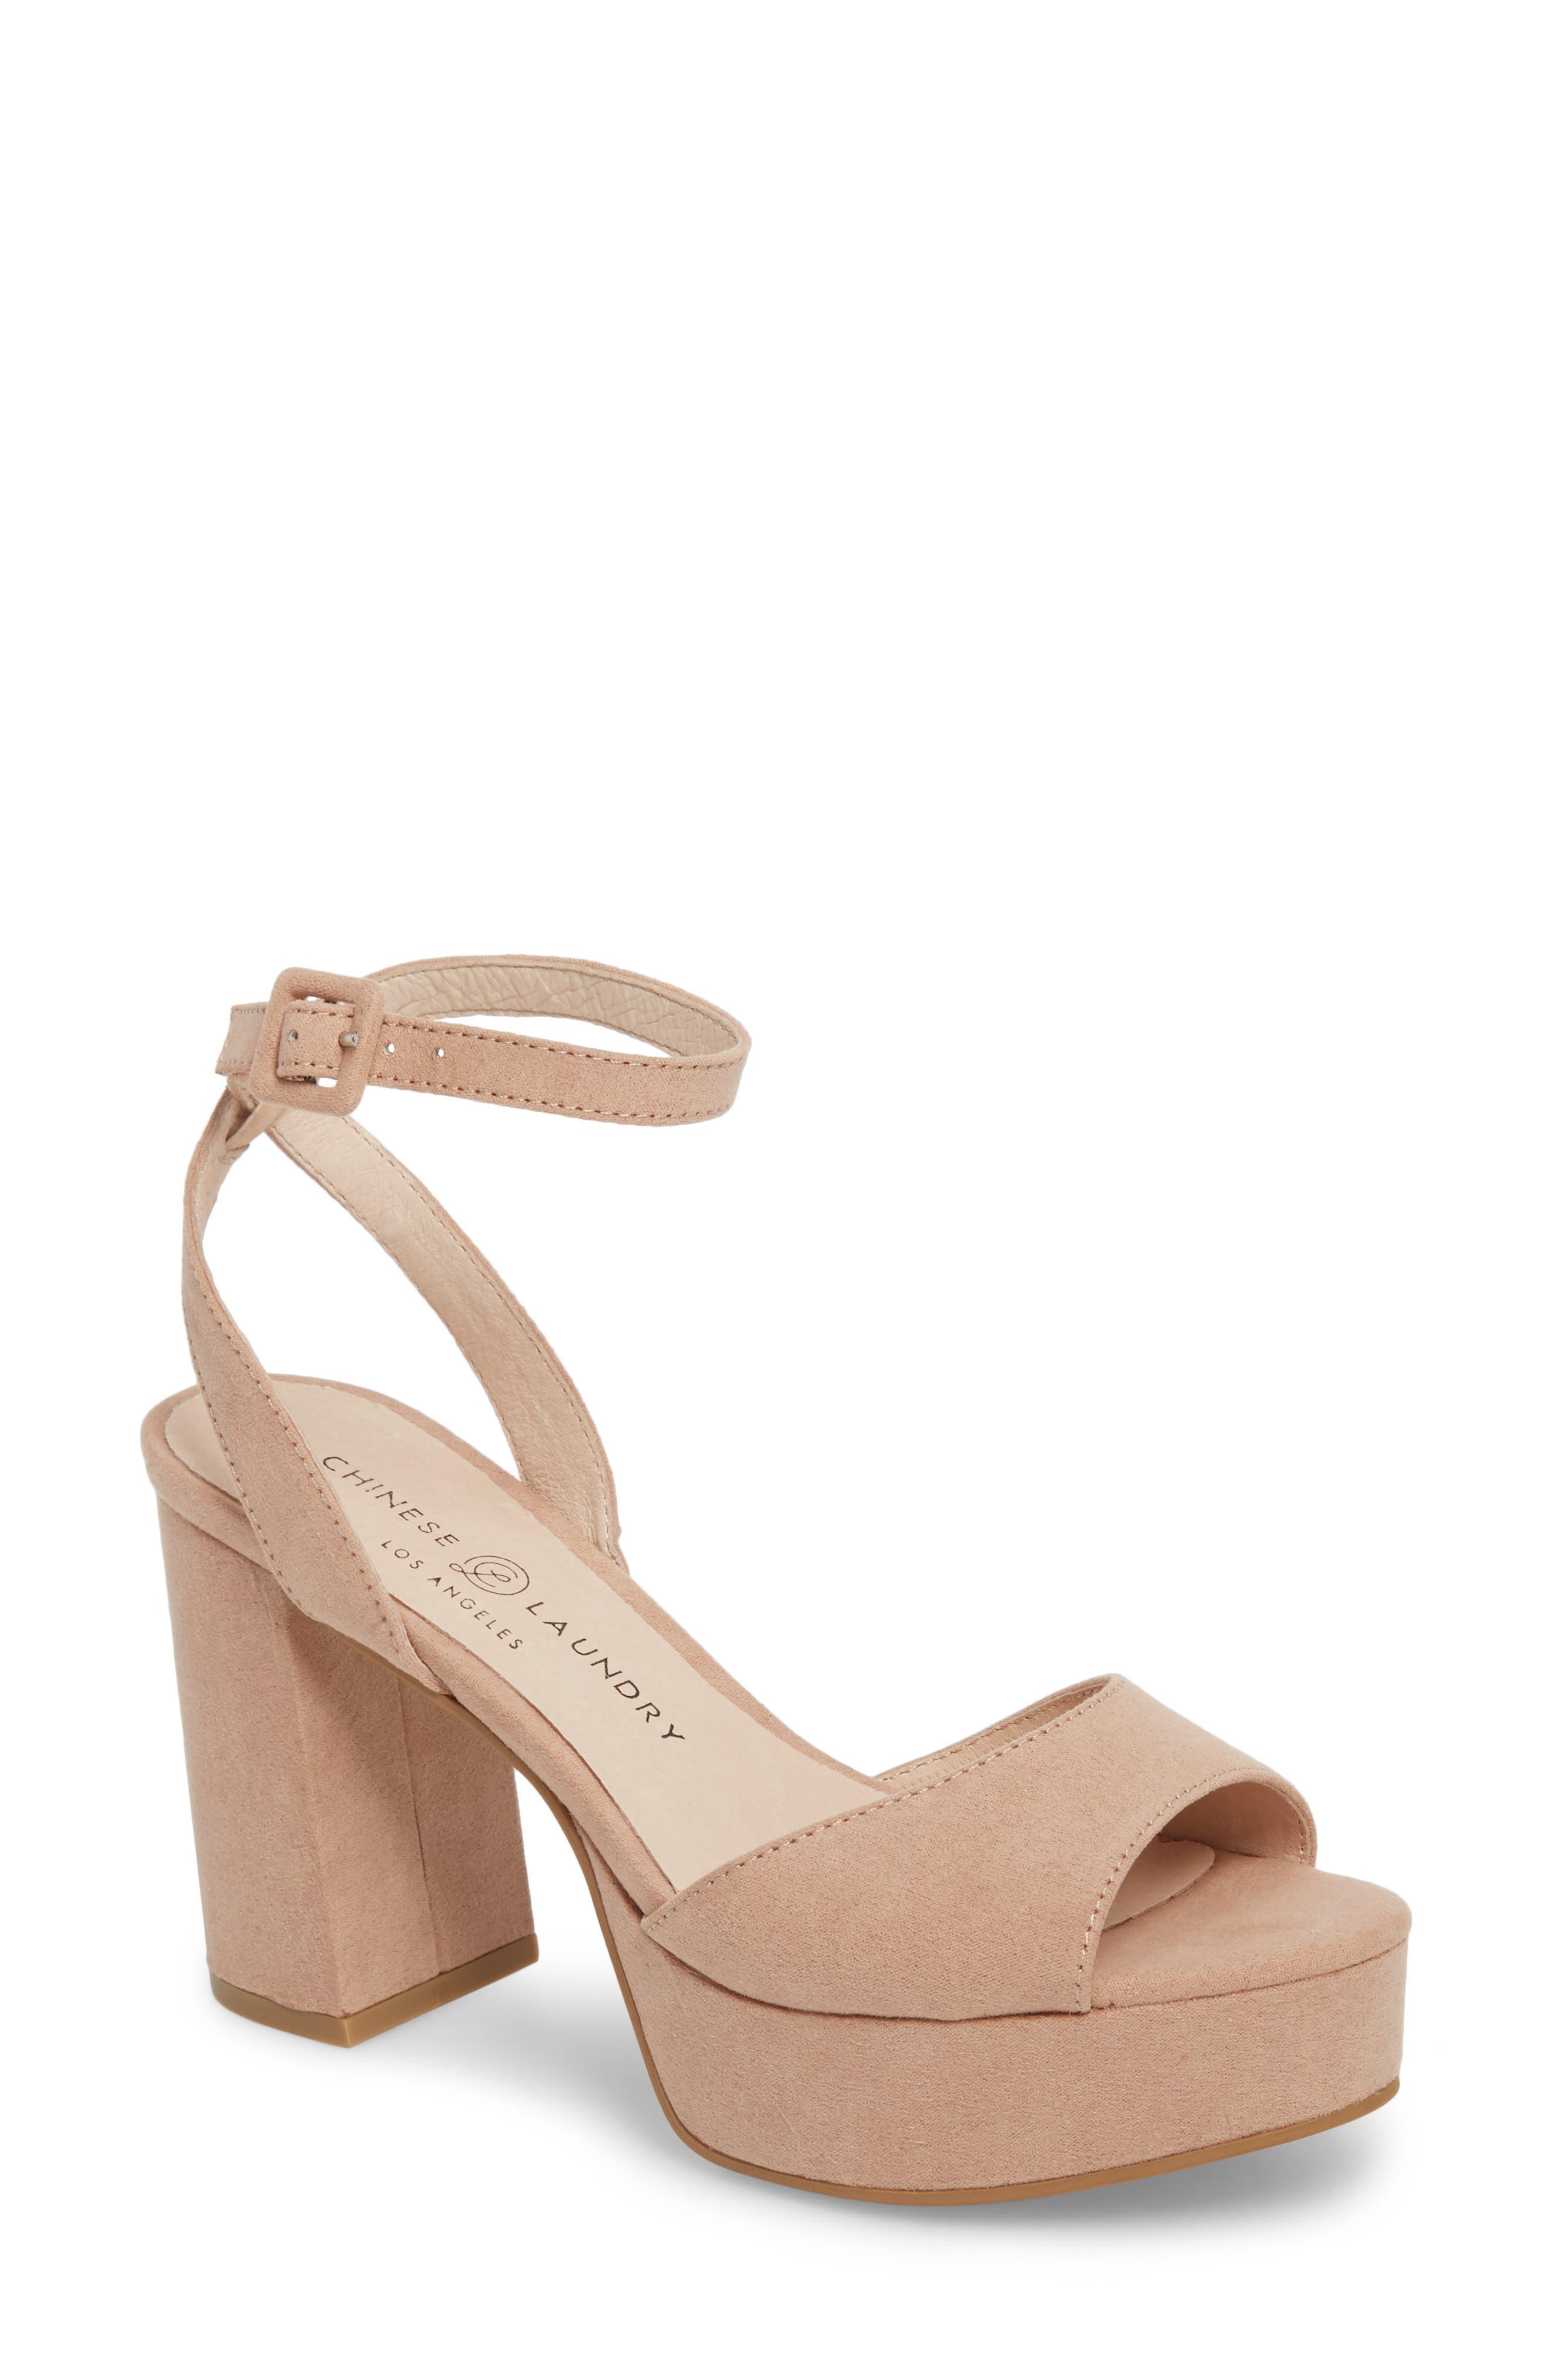 Theresa Platform Sandal,                         Main,                         color, Dark Nude